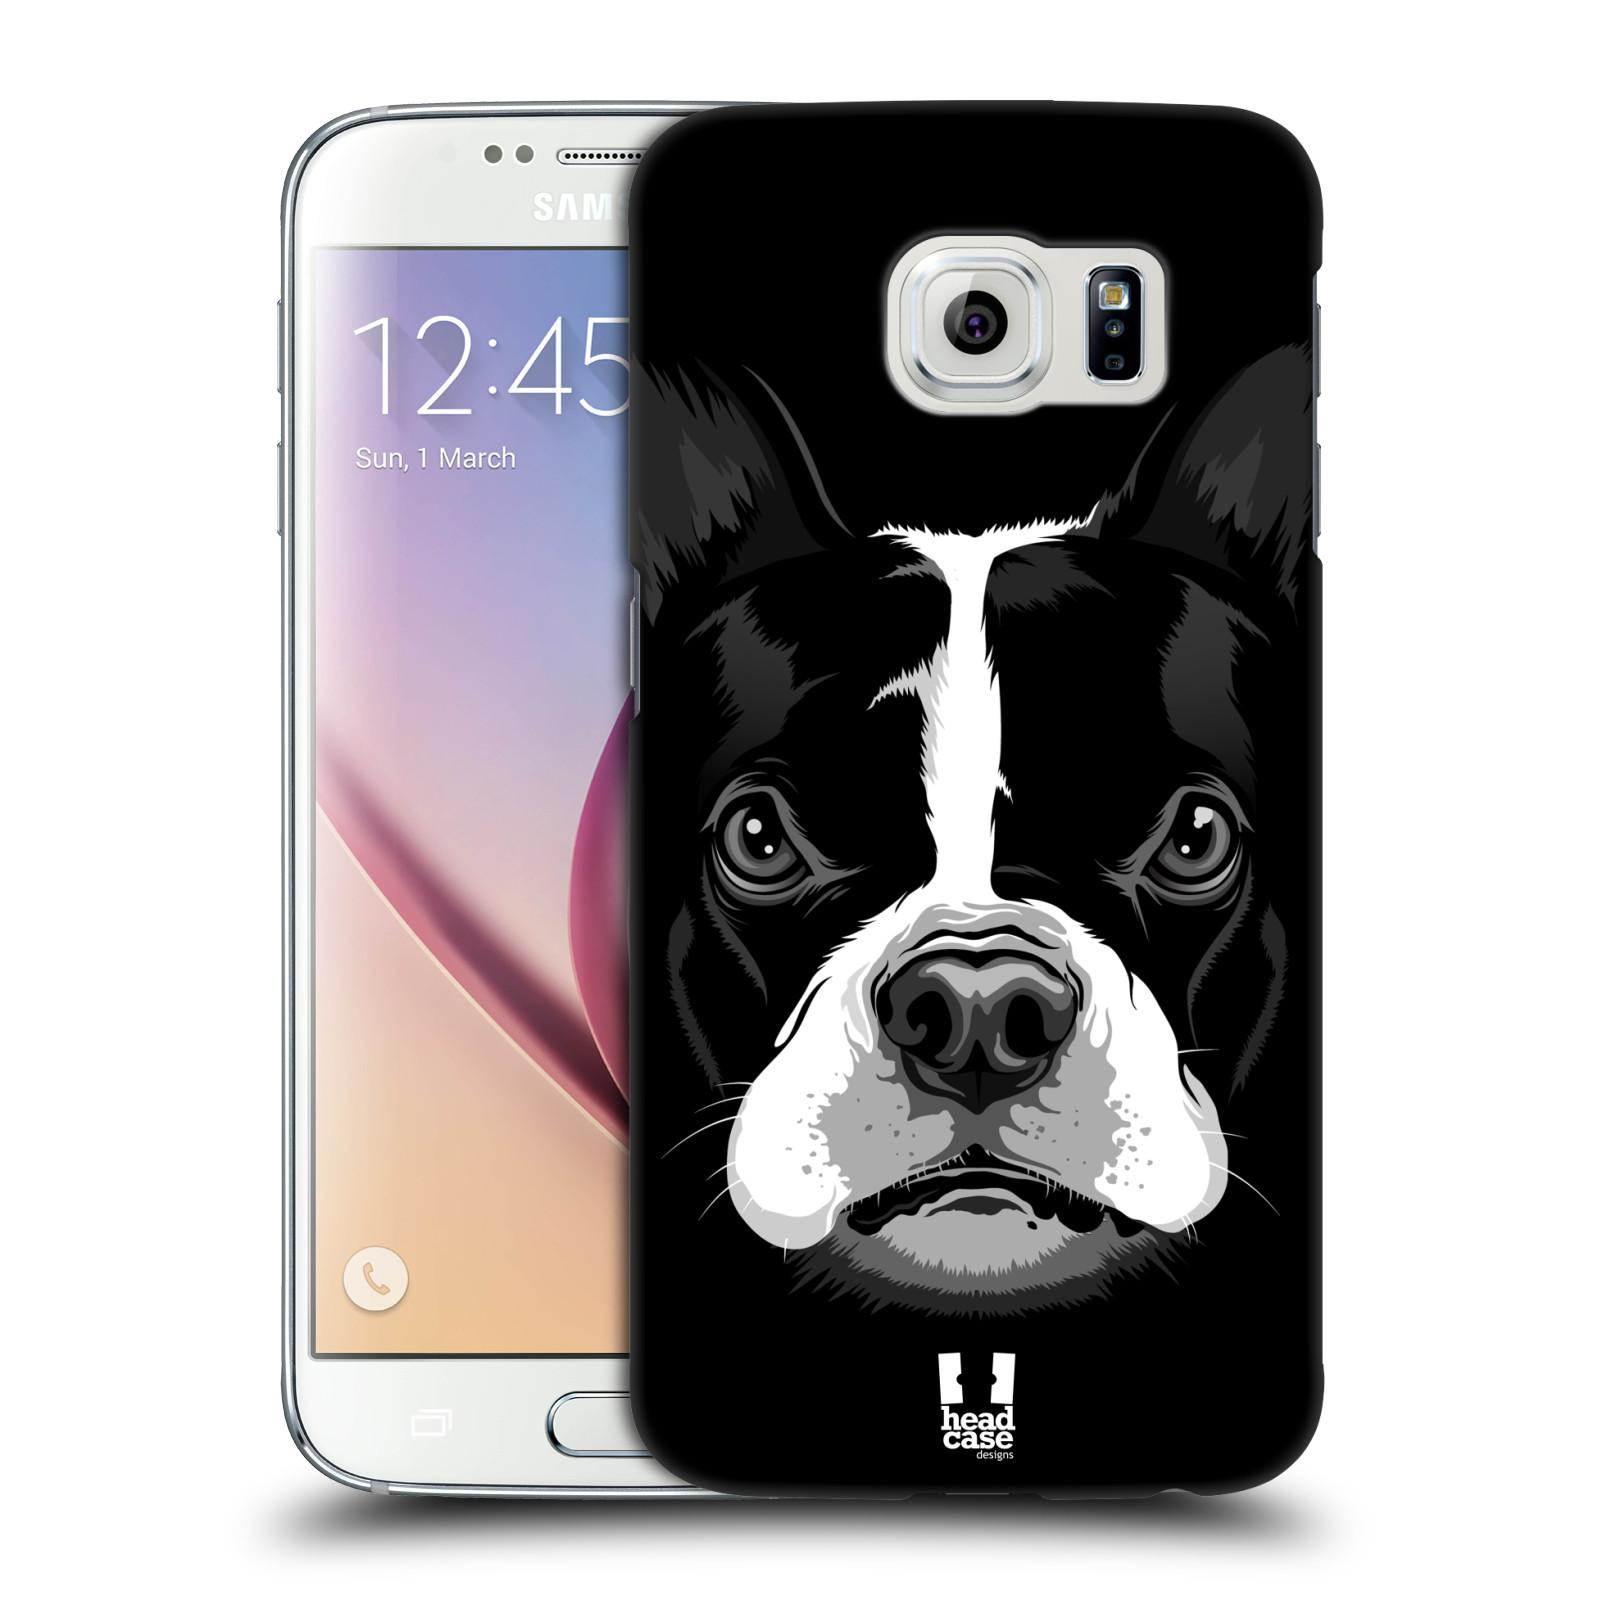 HEAD CASE plastový obal na mobil SAMSUNG Galaxy S6 (G9200, G920F) vzor Zvíře kreslená tvář 2 buldok